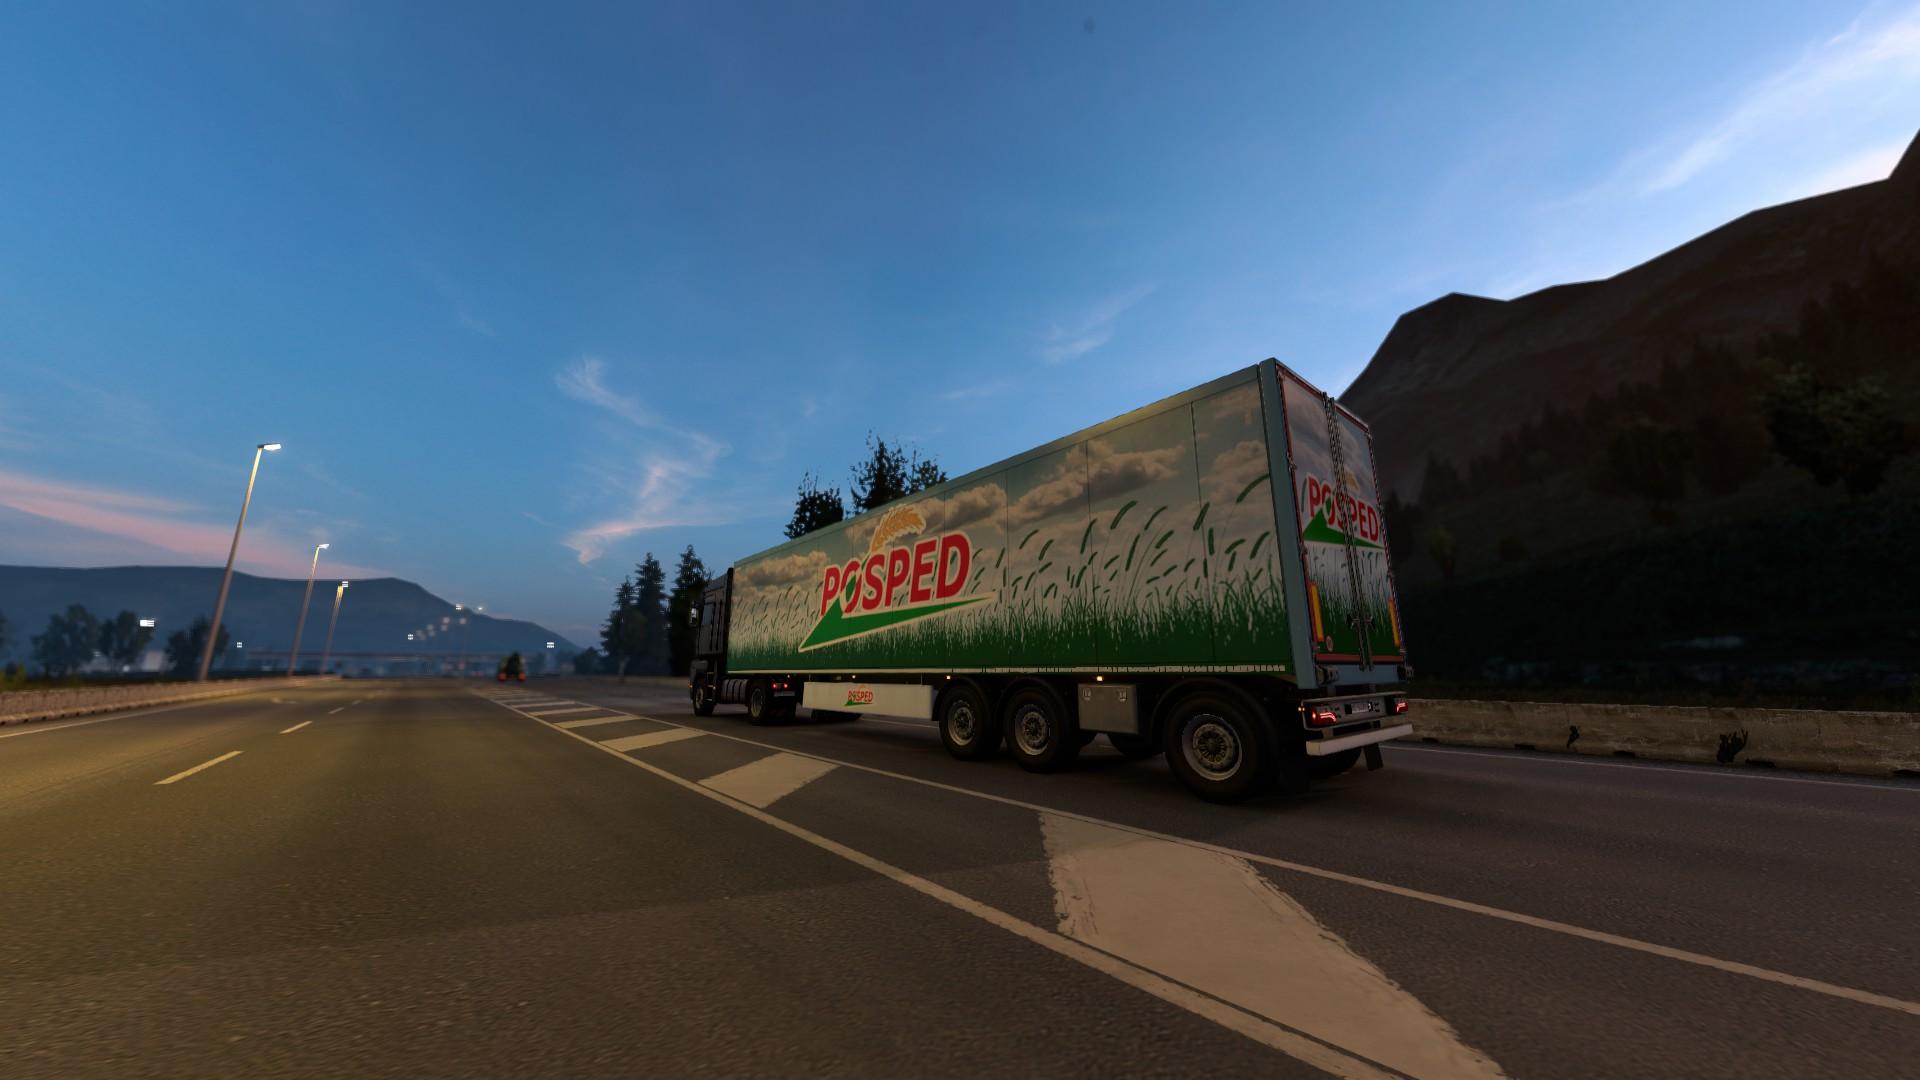 Euro Truck Simulator 2 Update 1.40 Evening Trailer